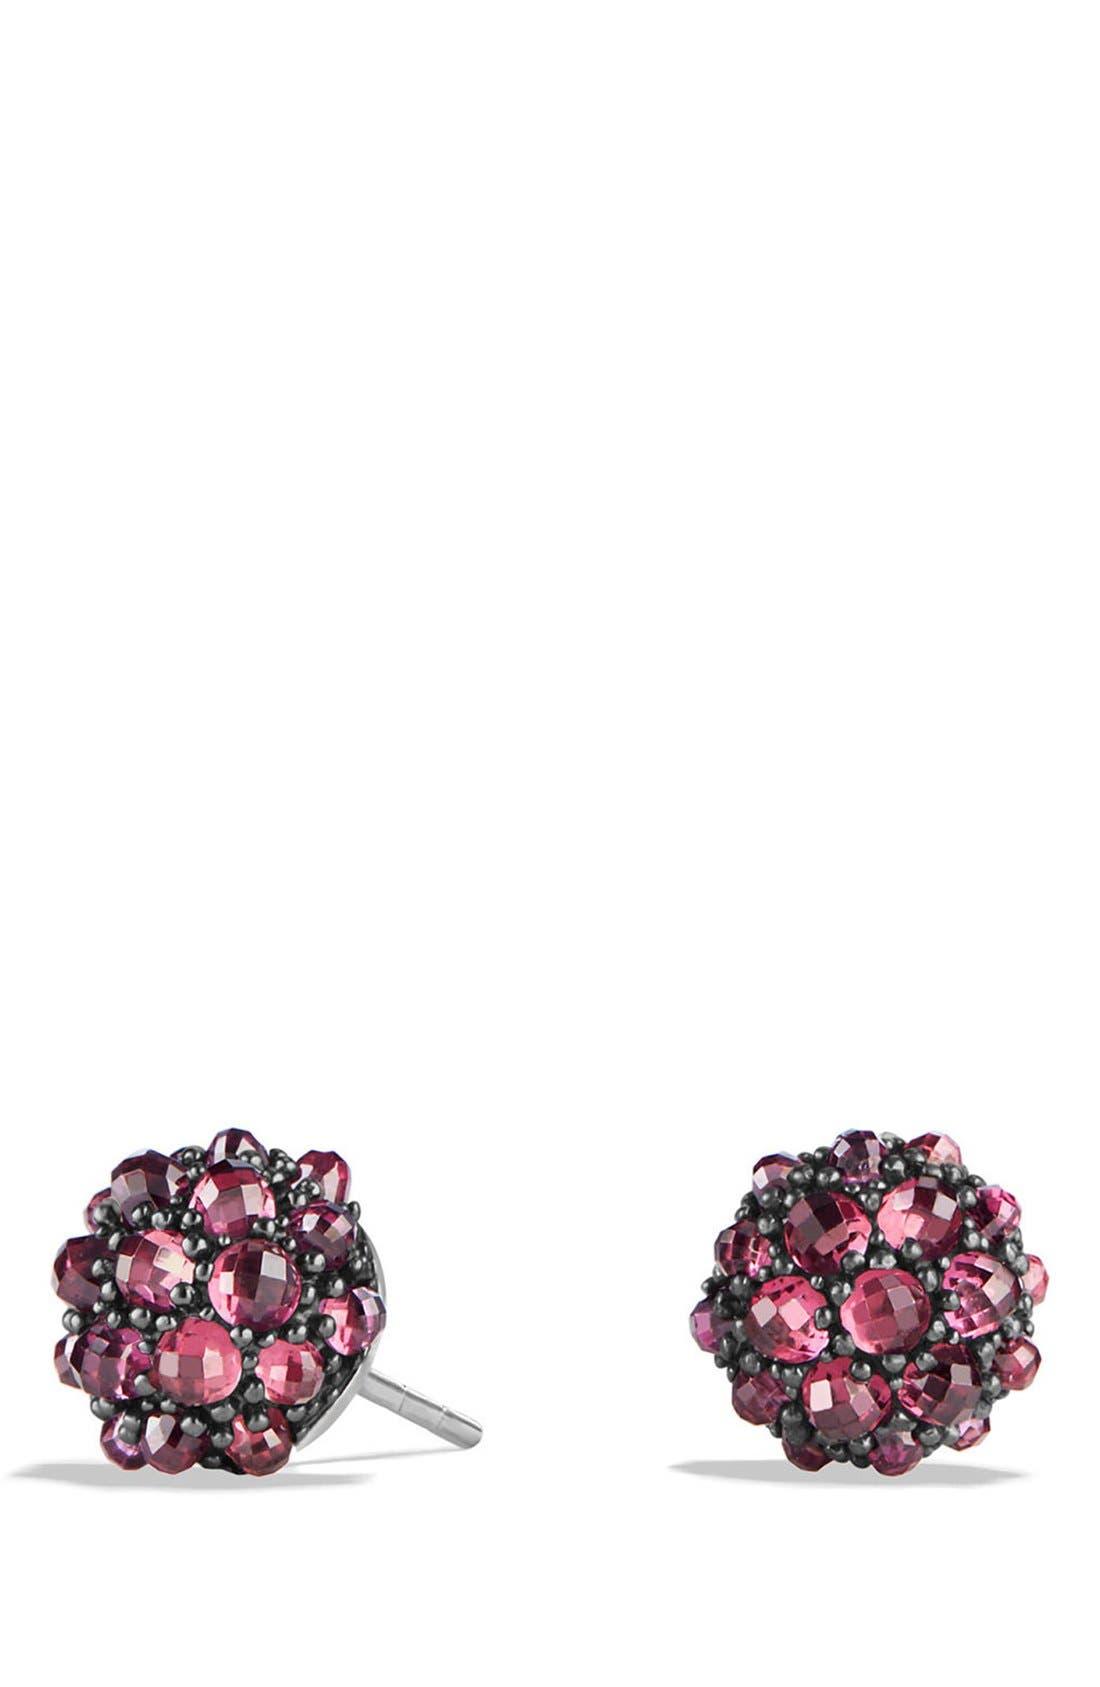 David Yurman Osetra Stud Earrings